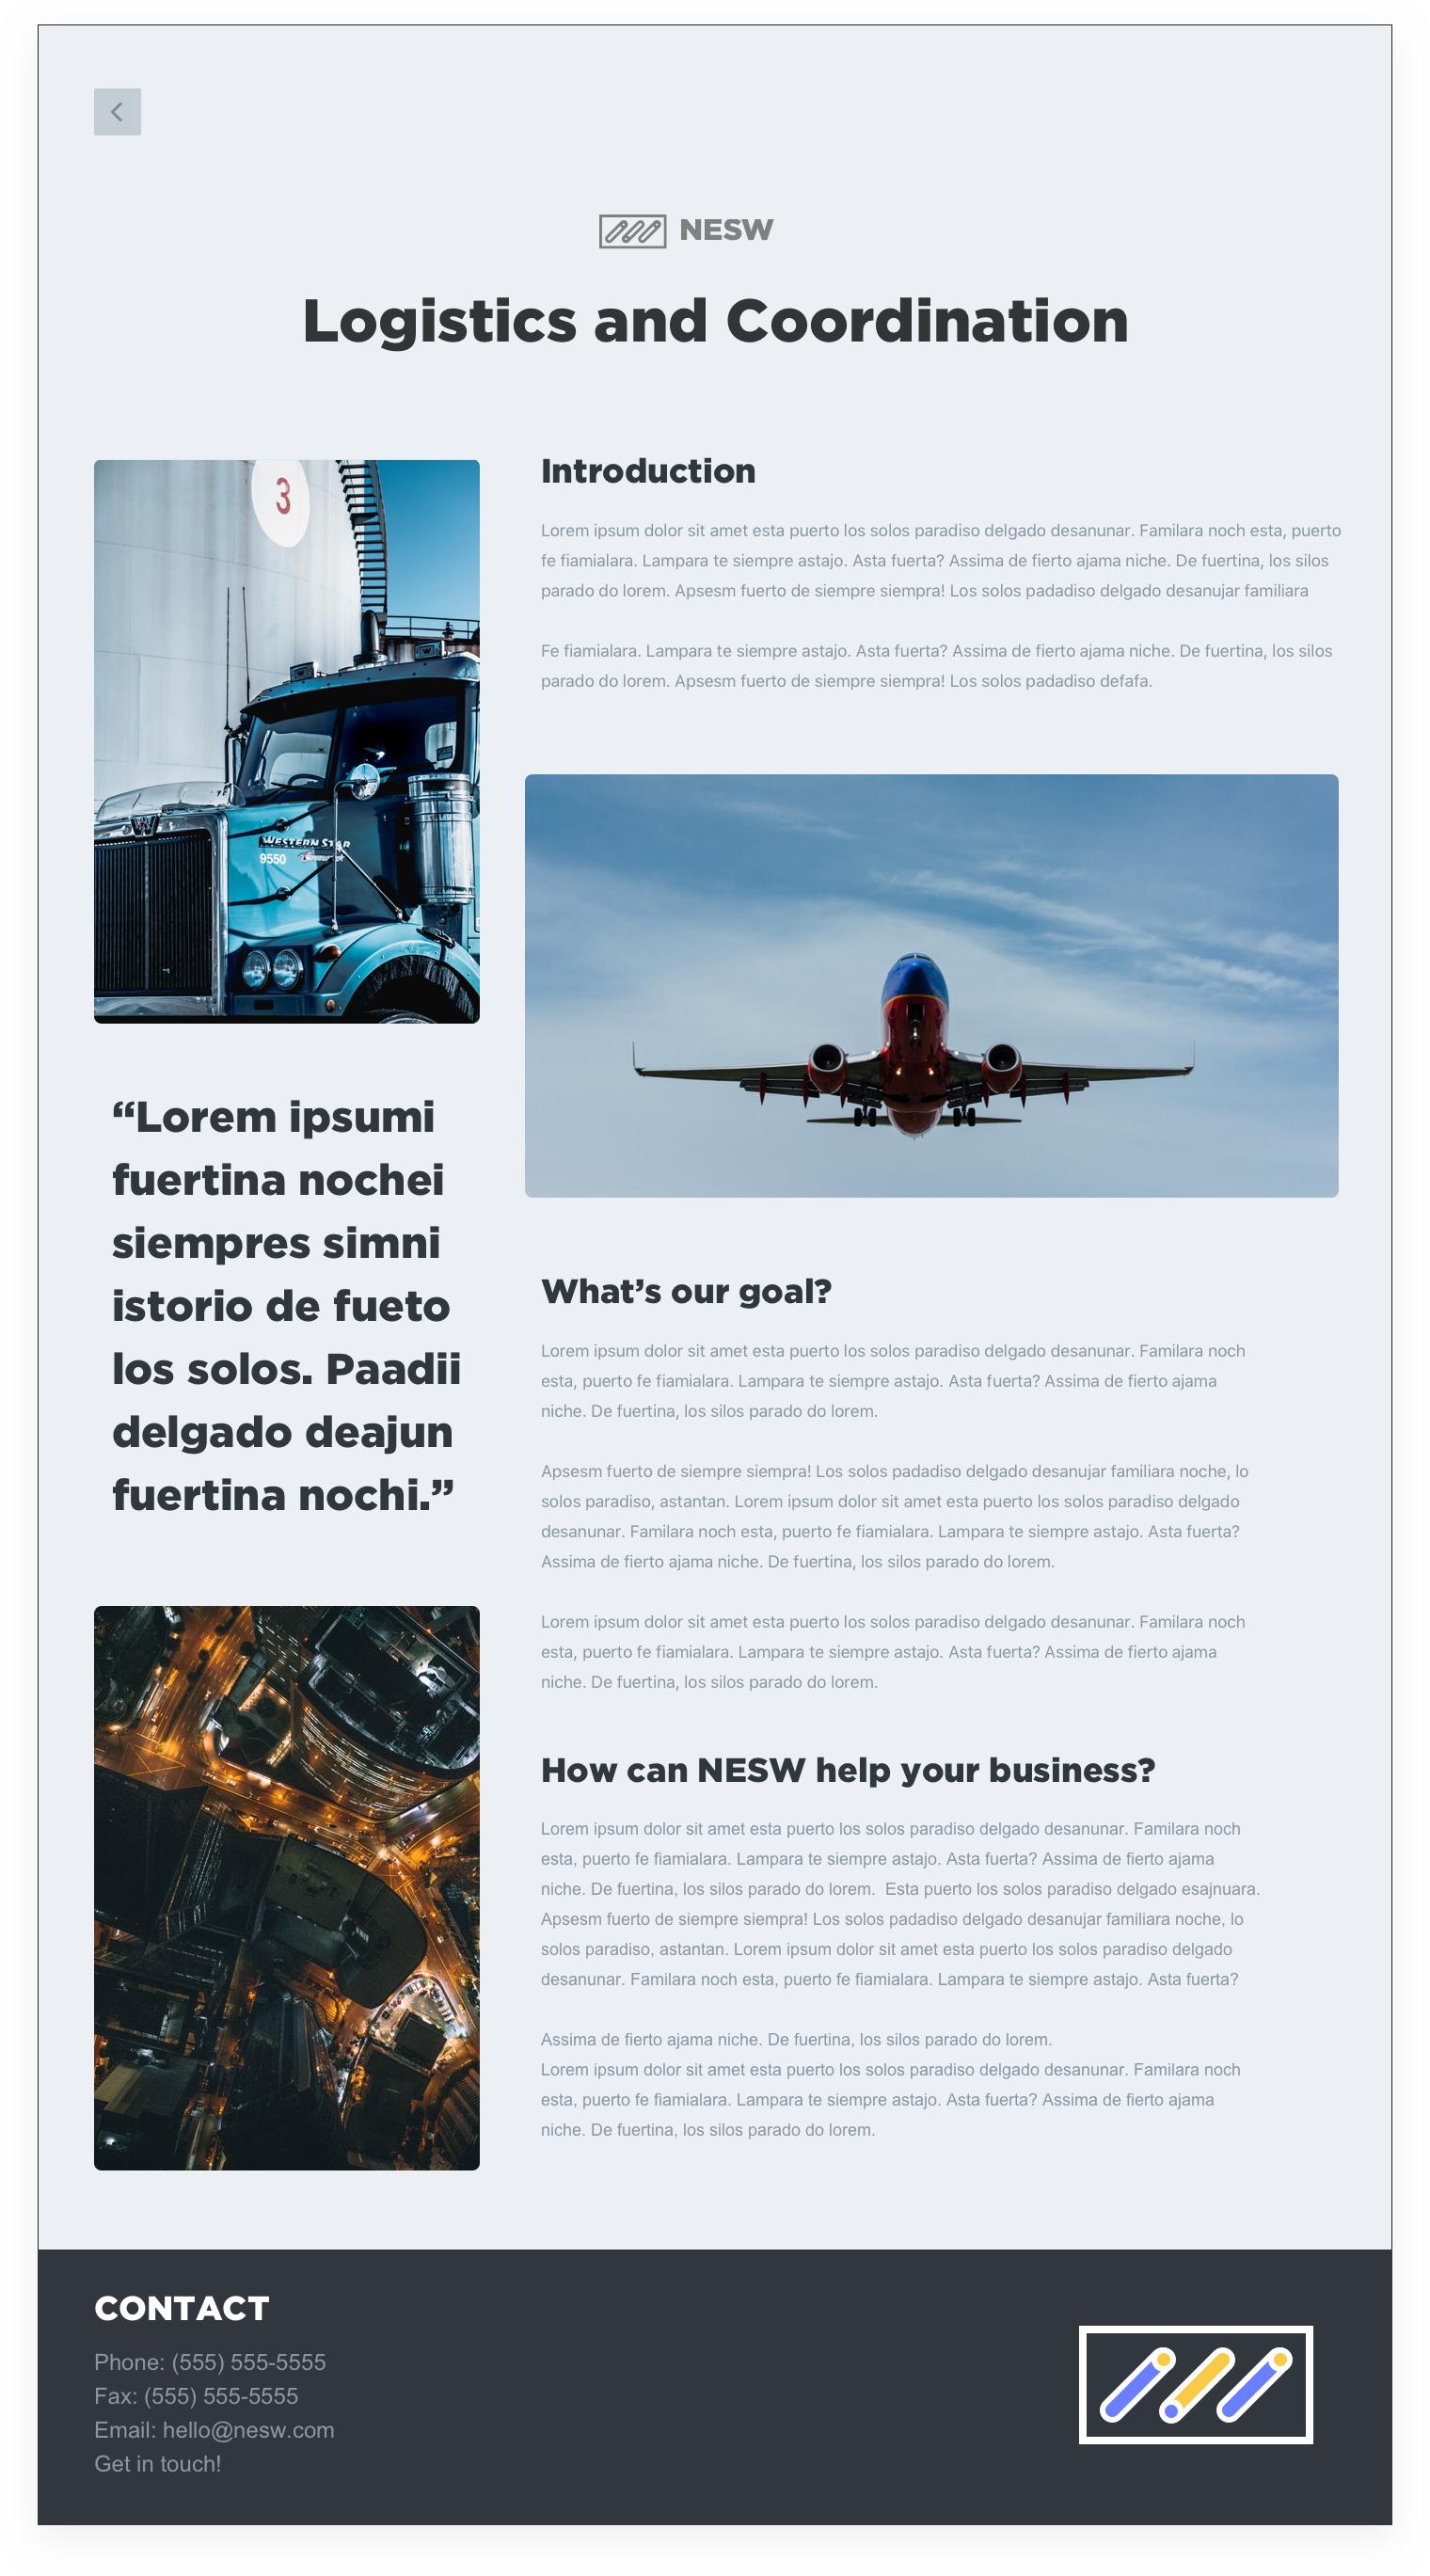 NESW Logistics and Coordination.jpg